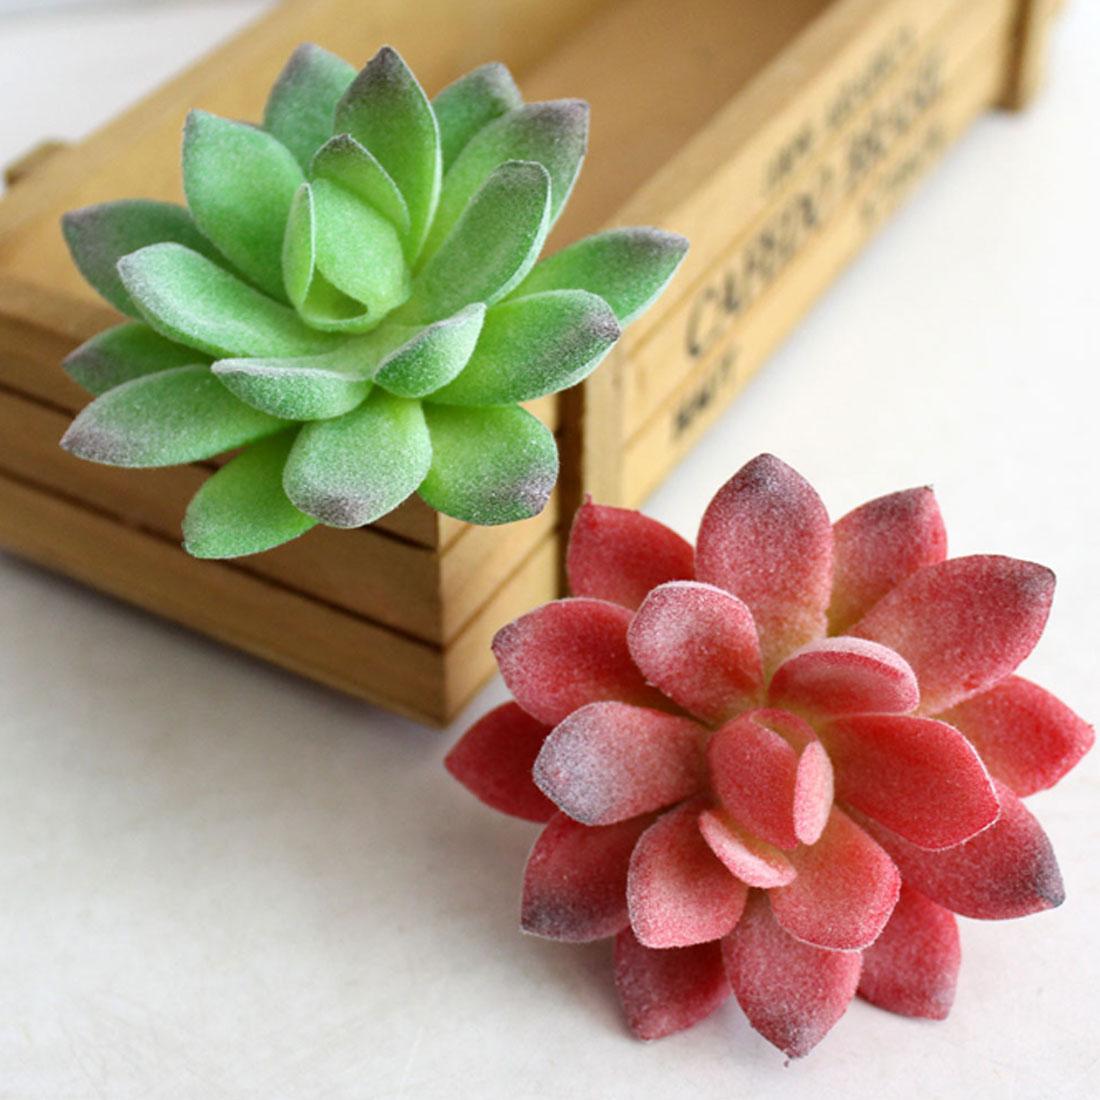 1PC Artificial Plants Succulent Frost Lotus Landscape Simulation Plant Home Office Flocking Fake Edelweiss Decoration